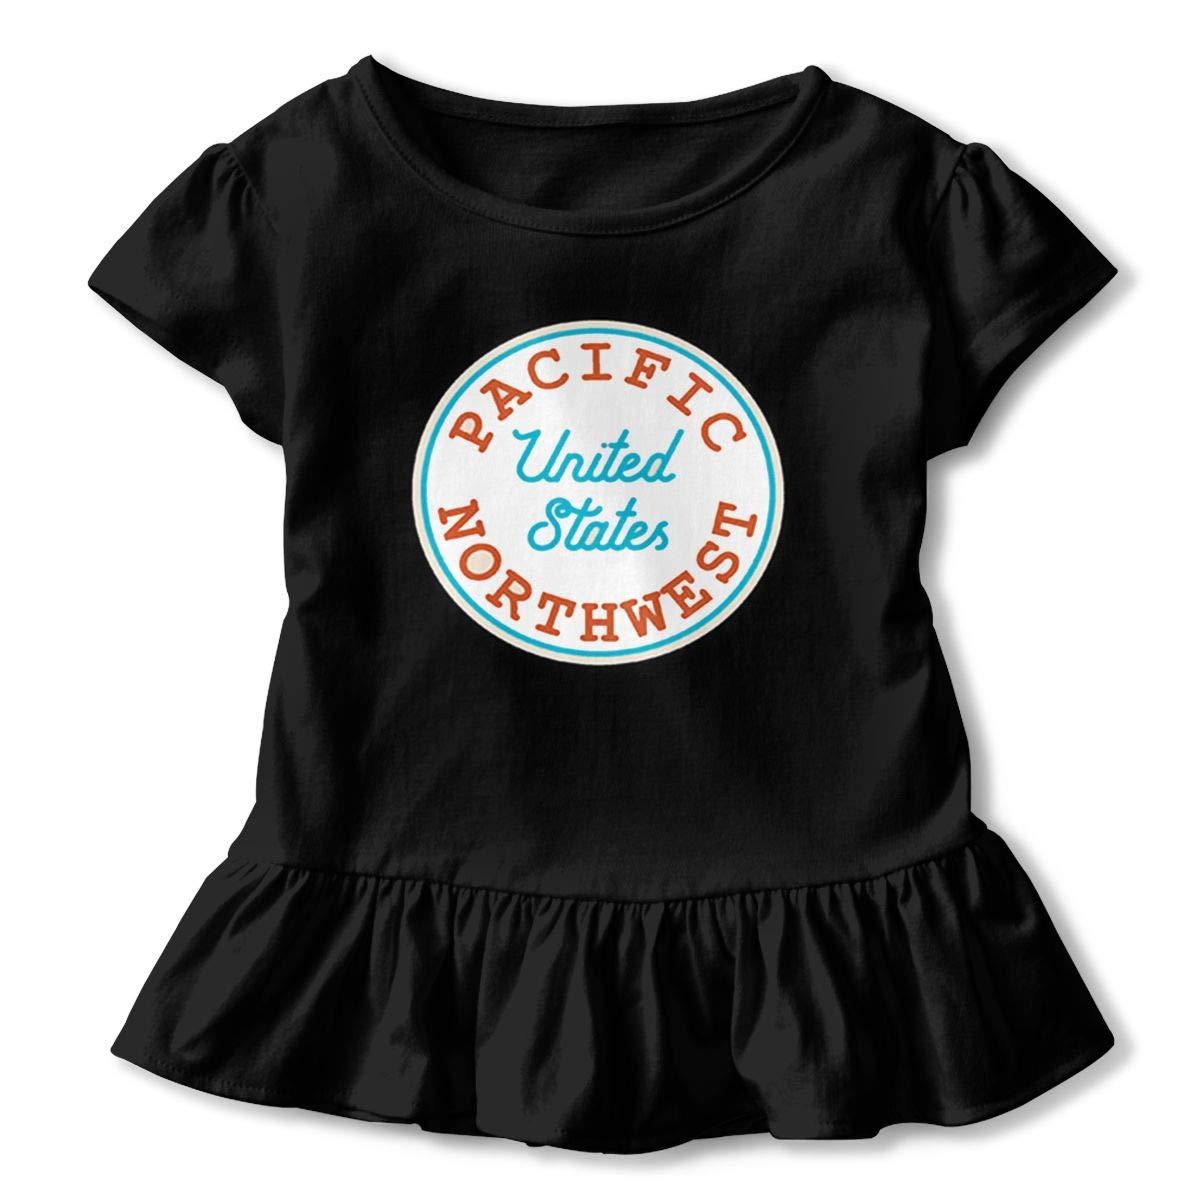 Pacific Northwest Shirt Design Kids Flounced T Shirts Basic Shirt for 2-6T Baby Girls